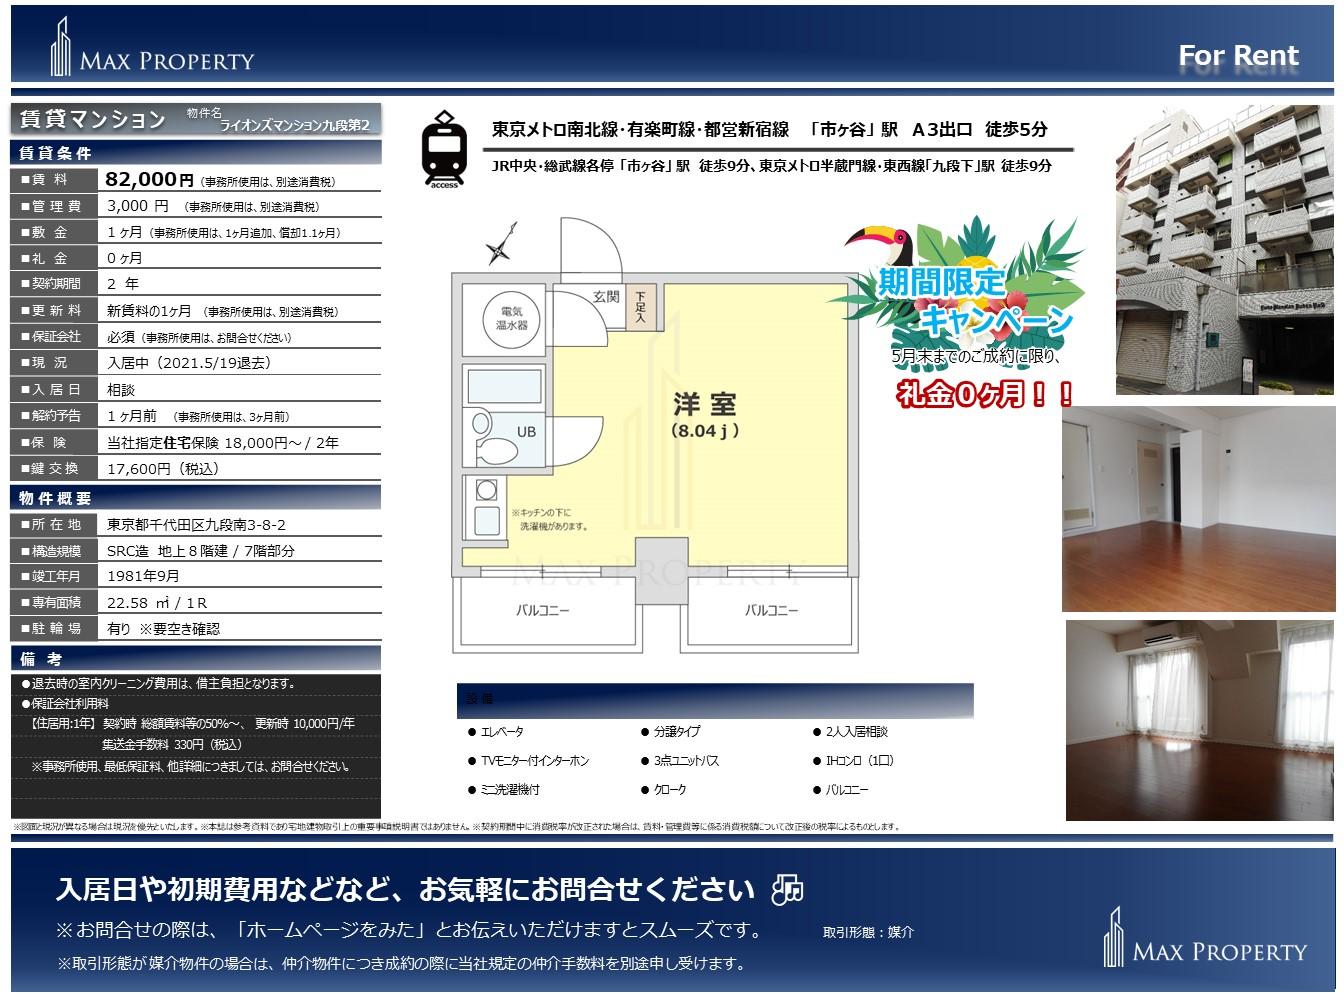 HP_ライオンズマンション九段第2_20210426